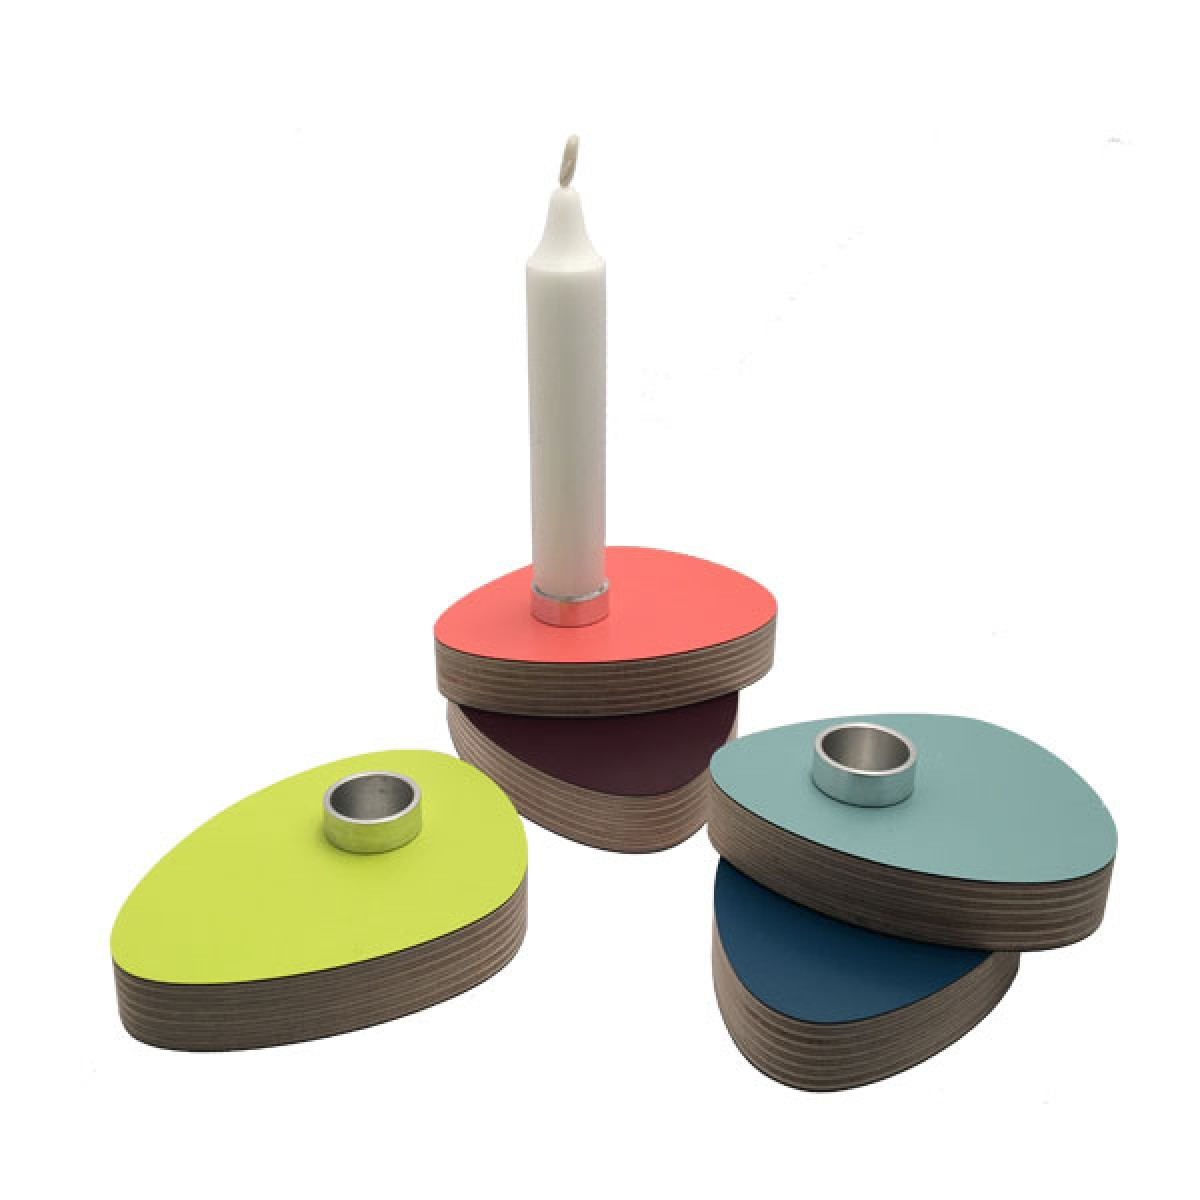 jack be nimble Kerzenständer / einzeln